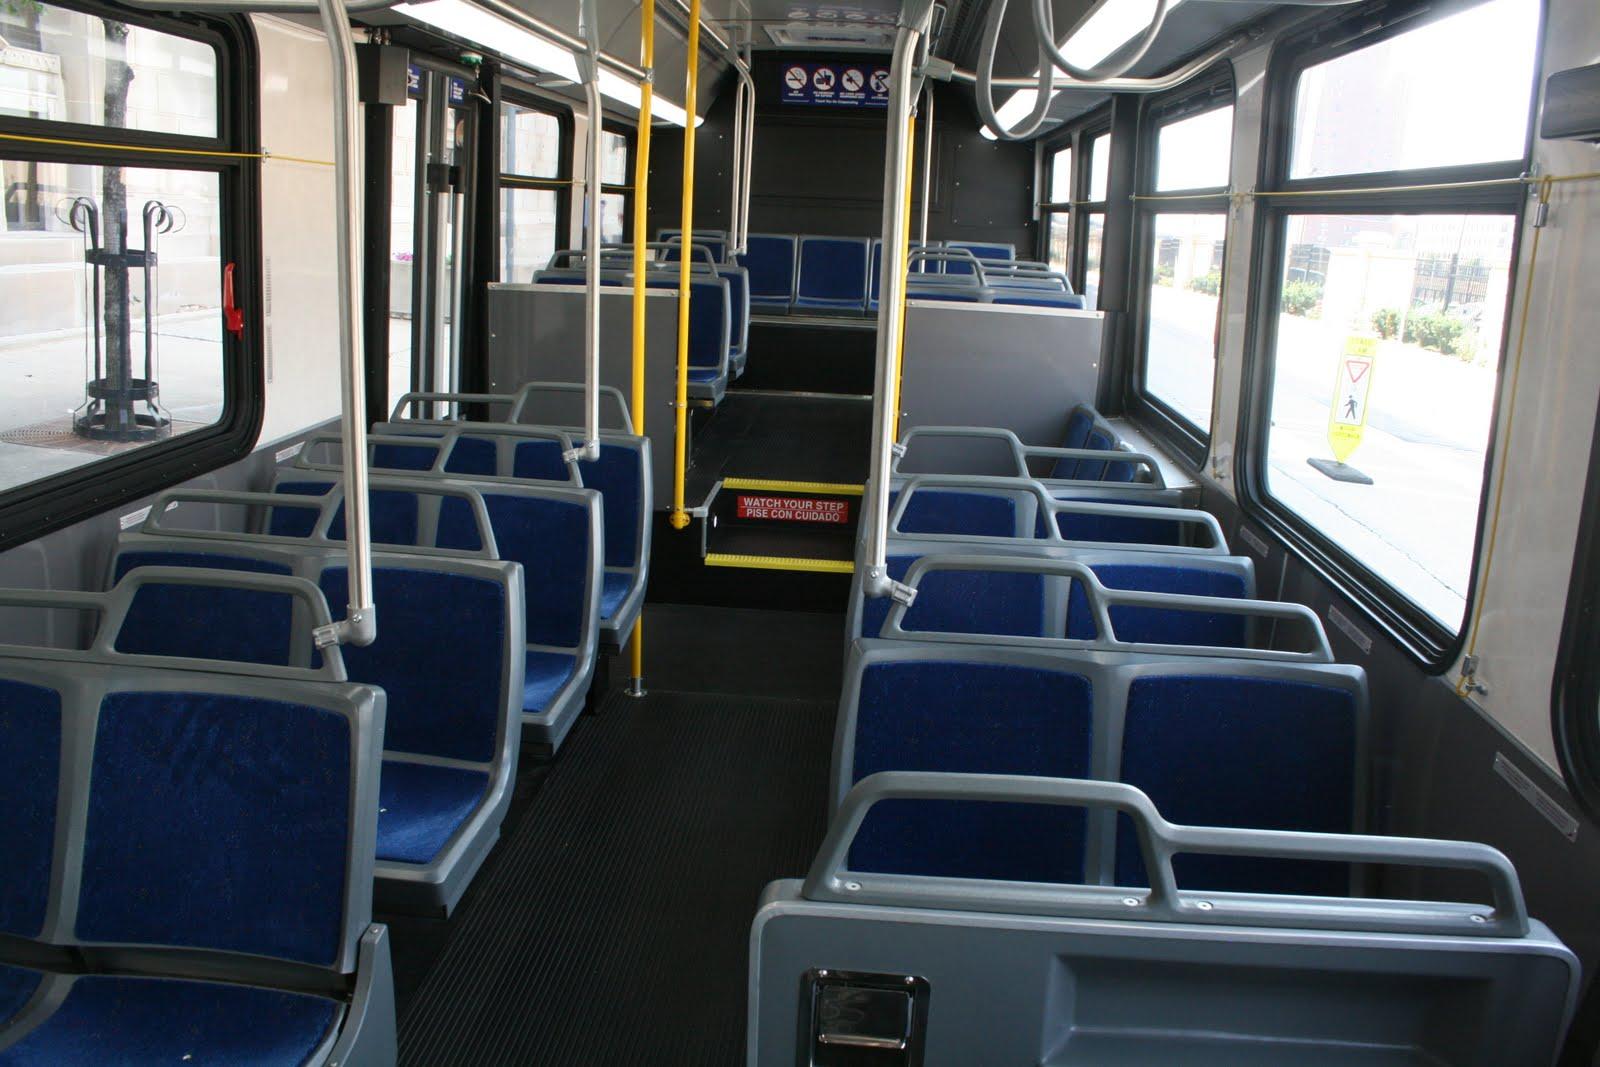 Florida Biodiesel Buses Debut Rts Adds 17 Vehicles